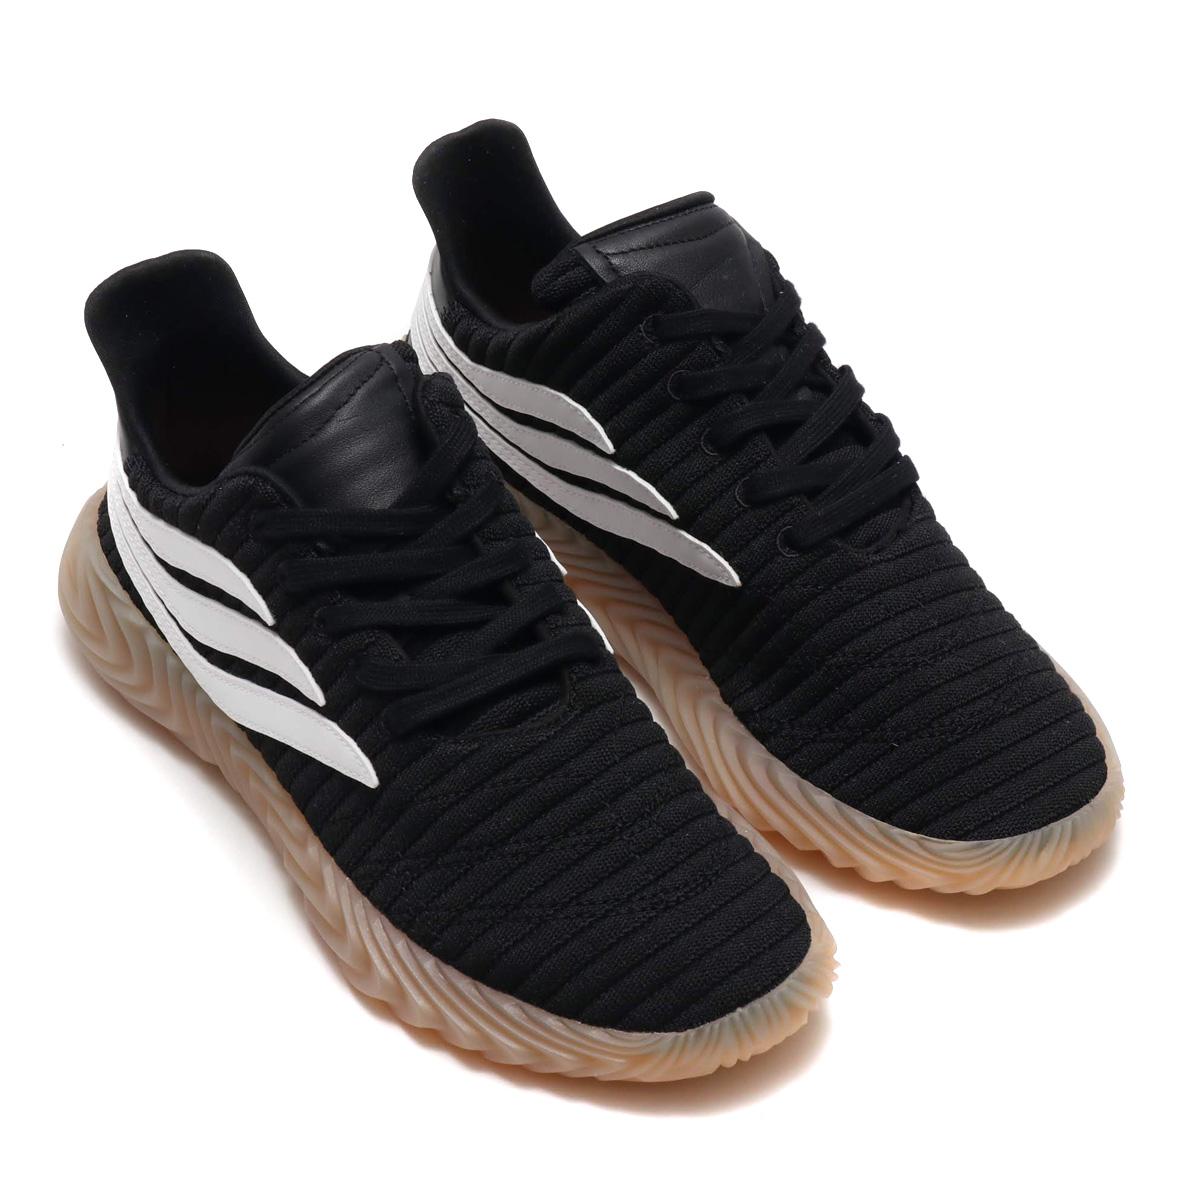 adidas Originals Sobakov(アディダス オリジナルス ソバコフ)CORE BLACK/RUNNING WHITE/GUM【メンズ スニーカー】18FA-I